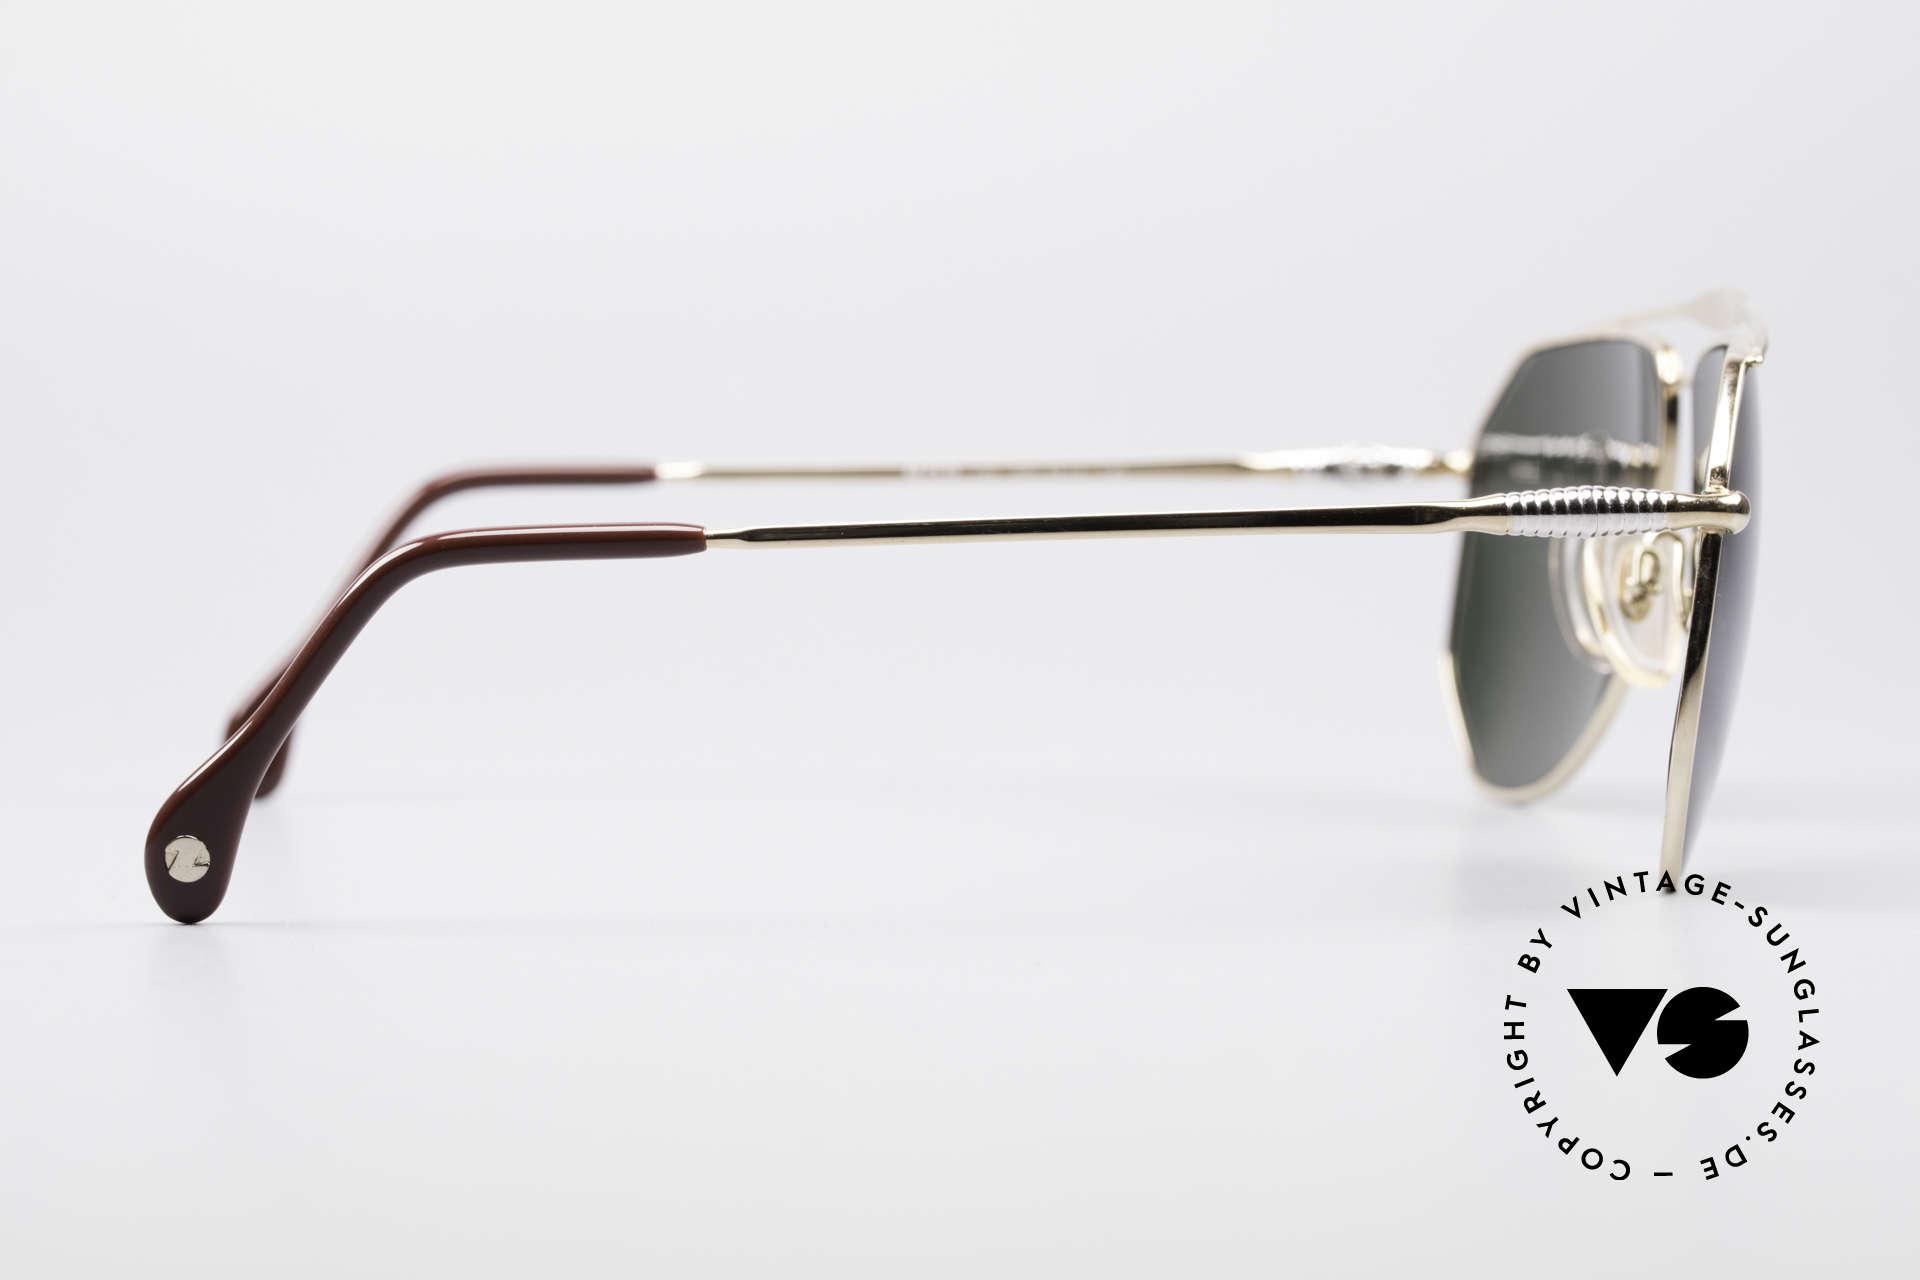 Zollitsch Cadre 120 Medium 80's Aviator Glasses, Size: medium, Made for Men